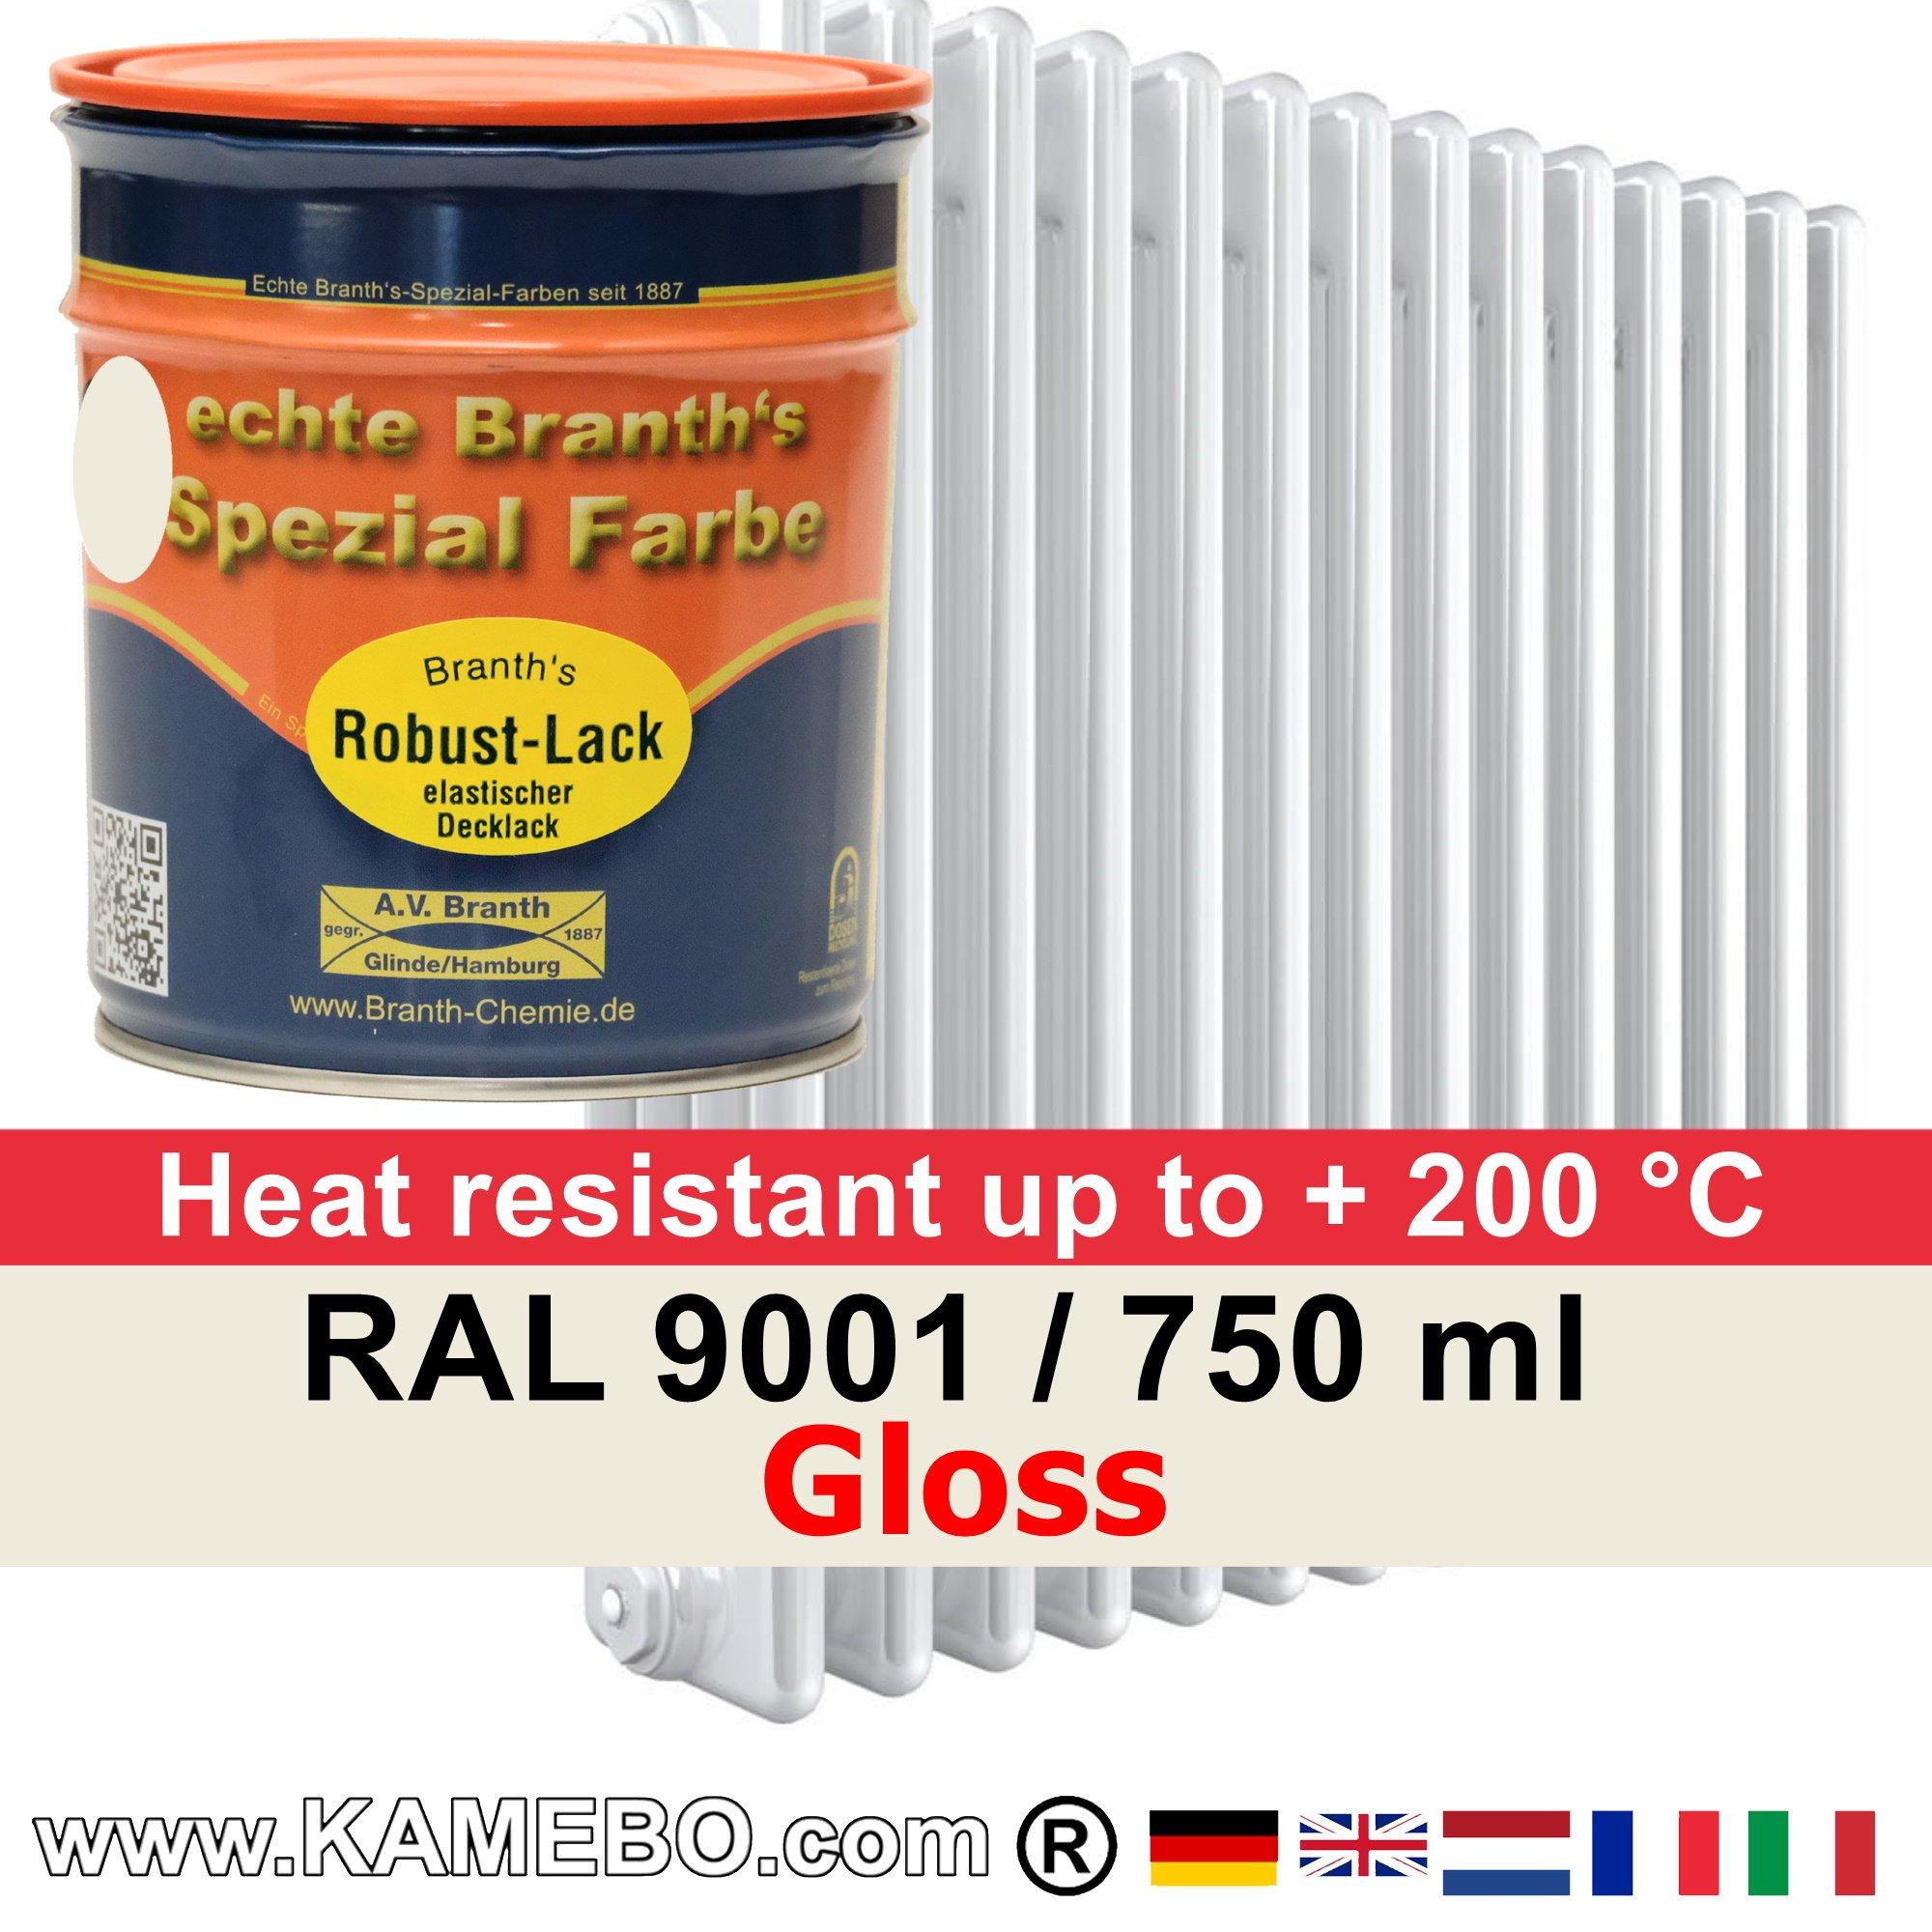 Vernice per radiatori 200 c bianco crema kamebo for Vernice per termosifoni